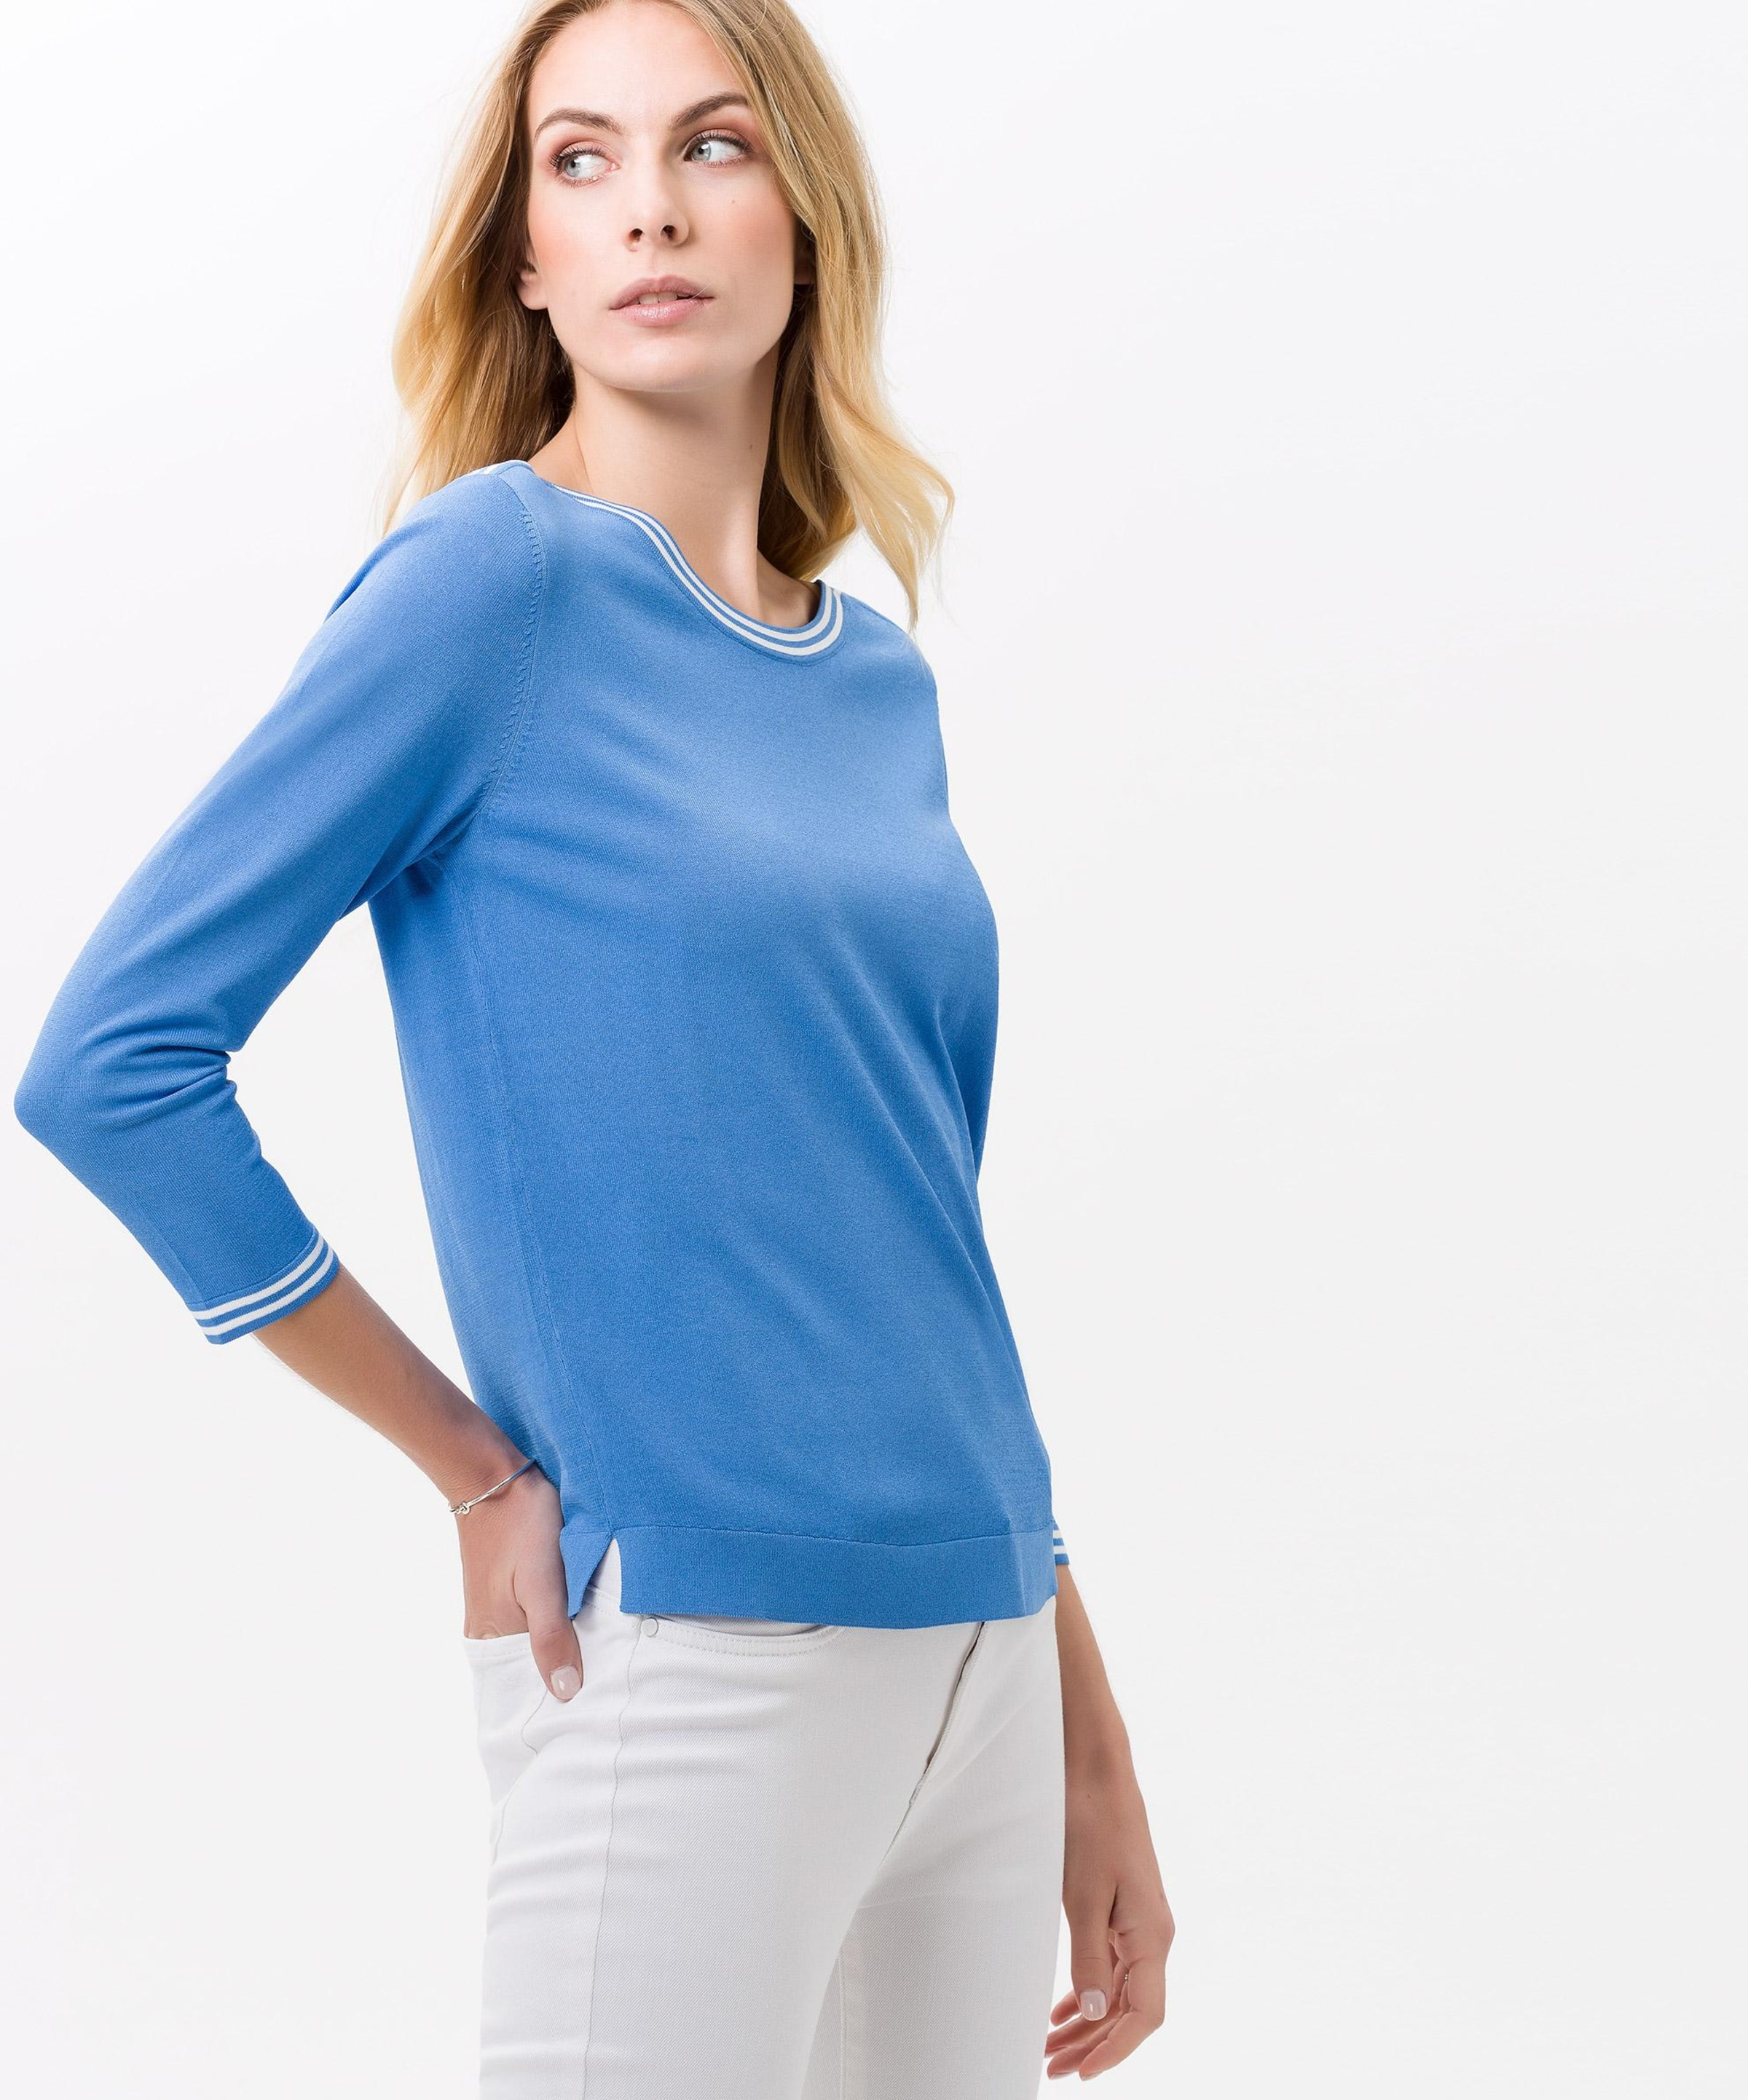 'lisa' In Pullover Brax Brax Pullover HimmelblauWei v8nNOym0w